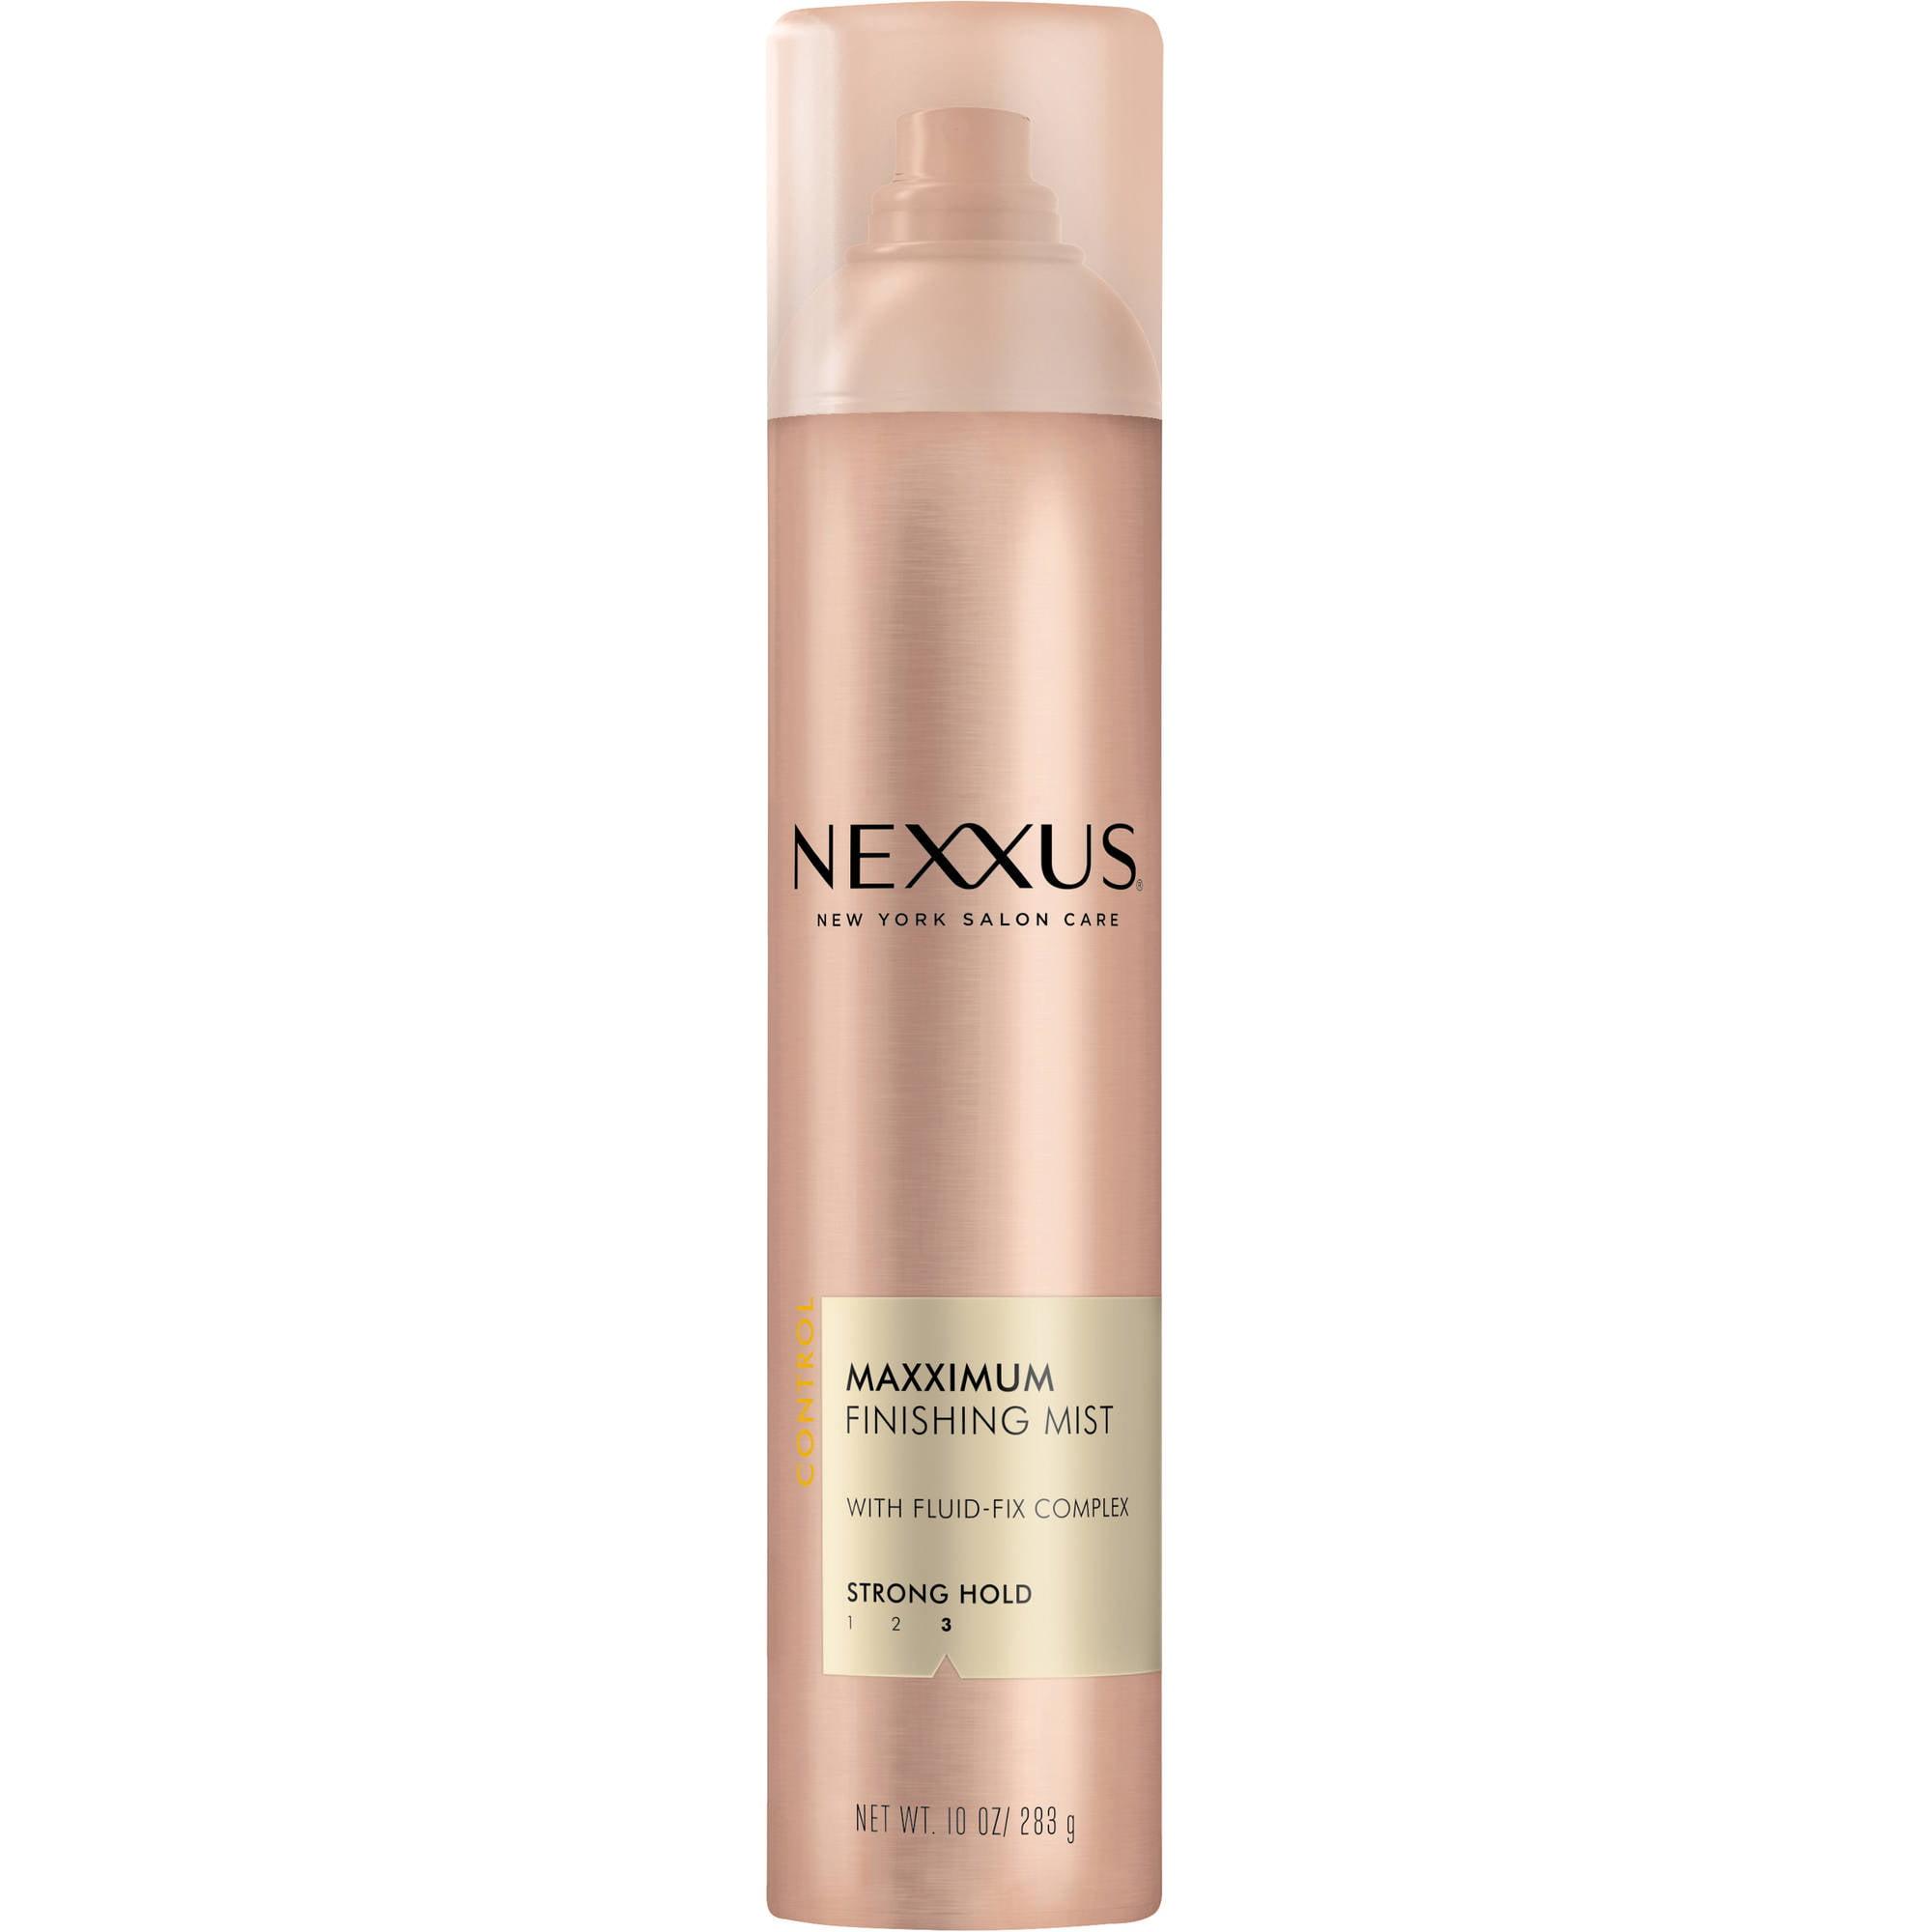 Nexxus Maxximum Hold Finishing Mist Hairspray, 10 oz